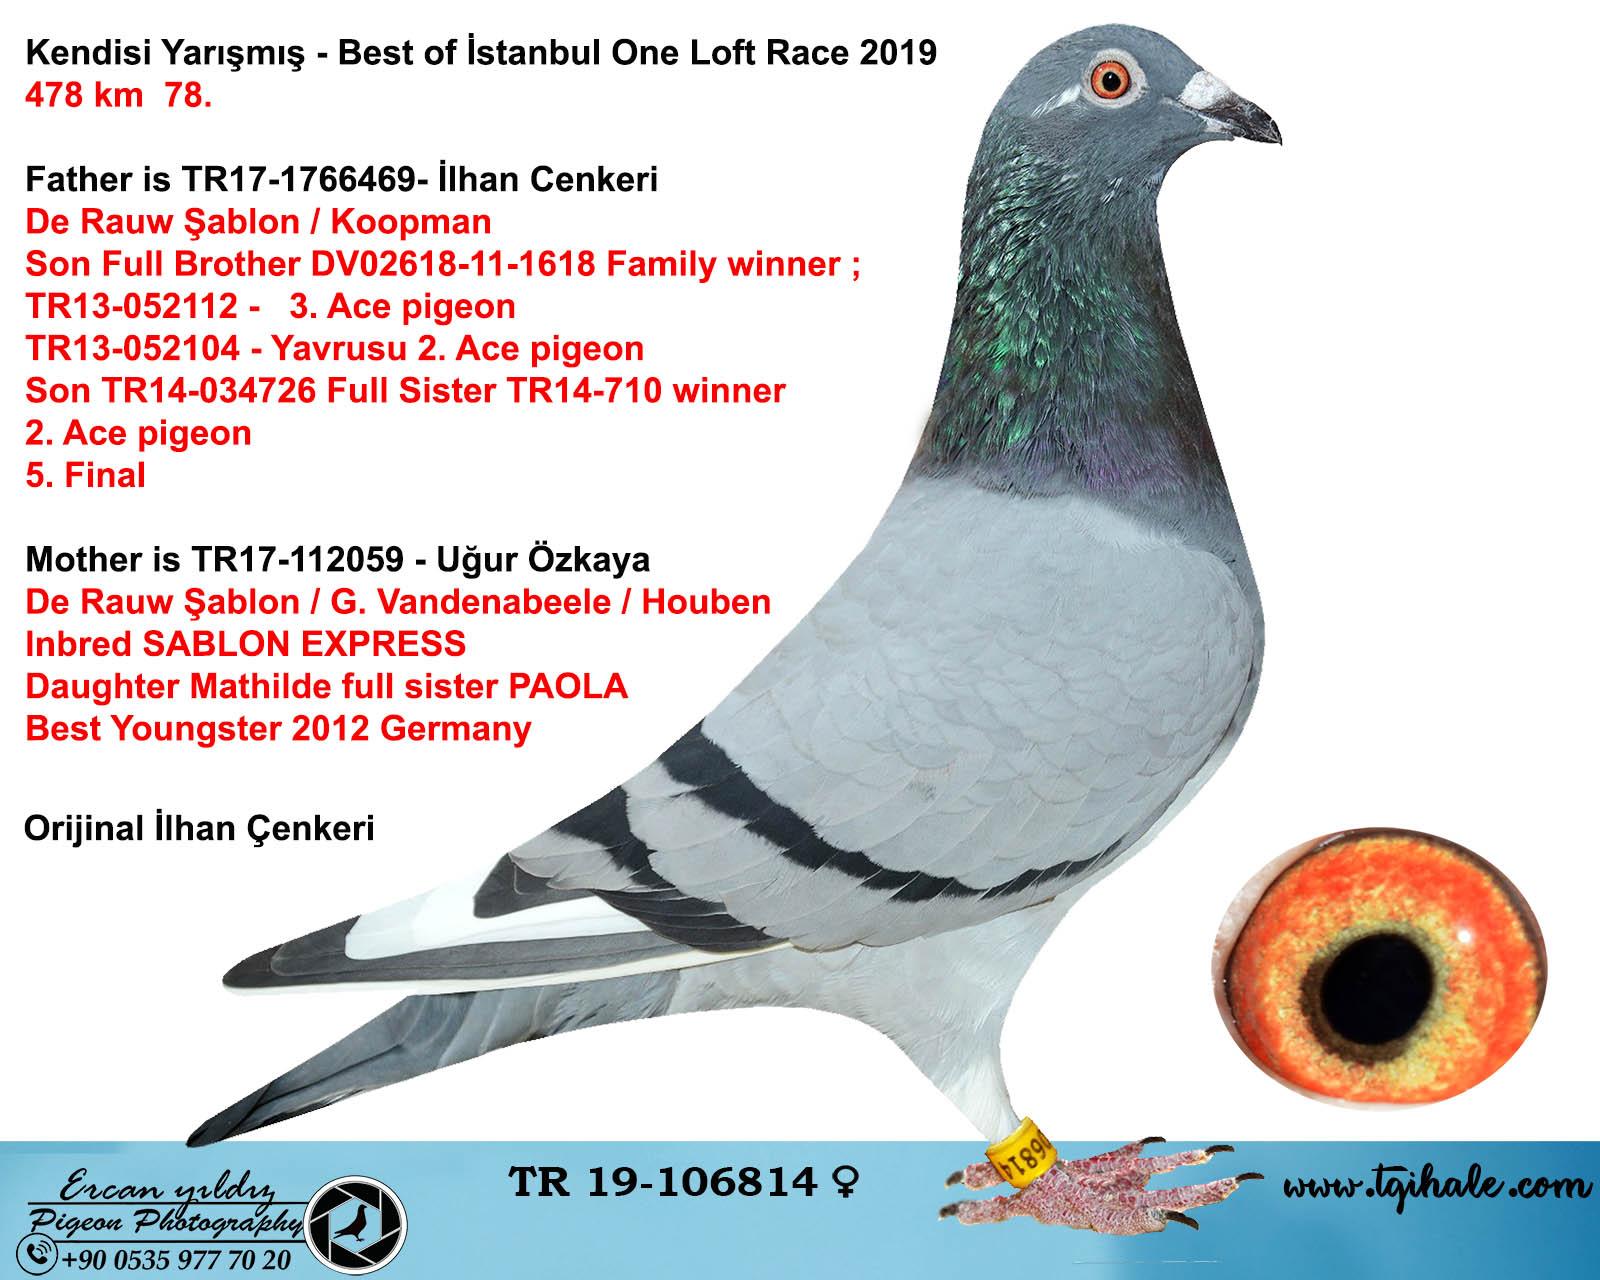 TR19-106814 DİŞİ / KENDİSİ BEST OF İSTANBUL OLR 2019  FİNAL 78.